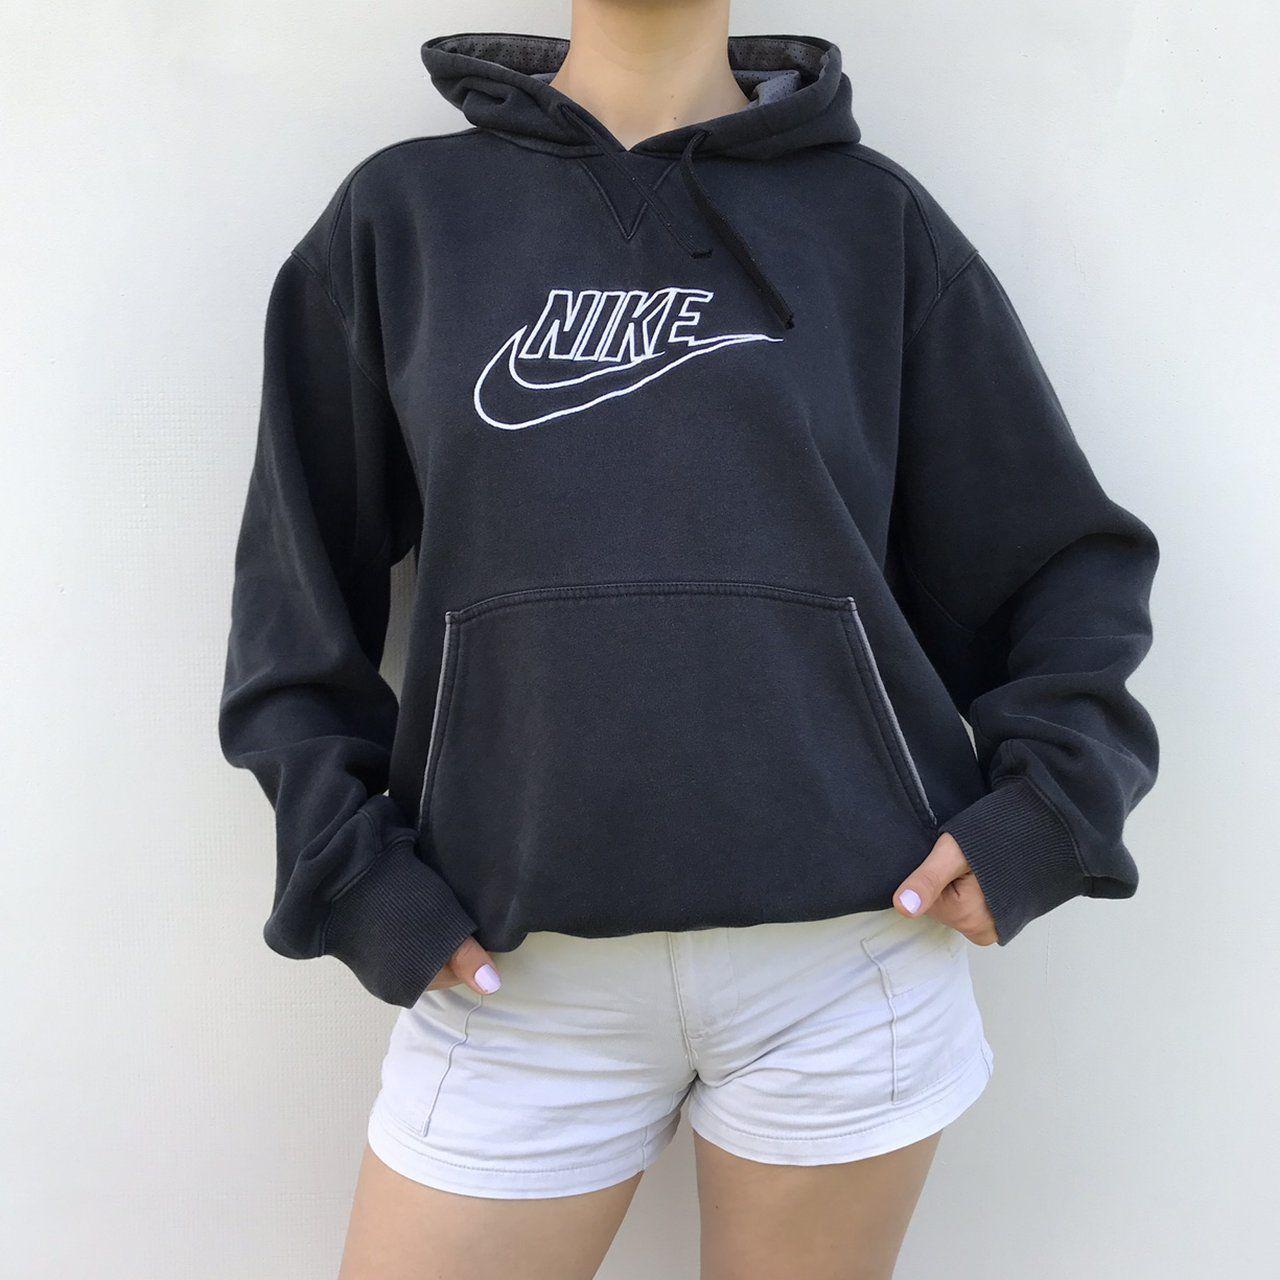 Unisex Vintage Nike Hoodie Embroidered Logo Size Depop Vintage Hoodies Nike Hoodie Outfit Vintage Nike Sweatshirt [ 1280 x 1280 Pixel ]